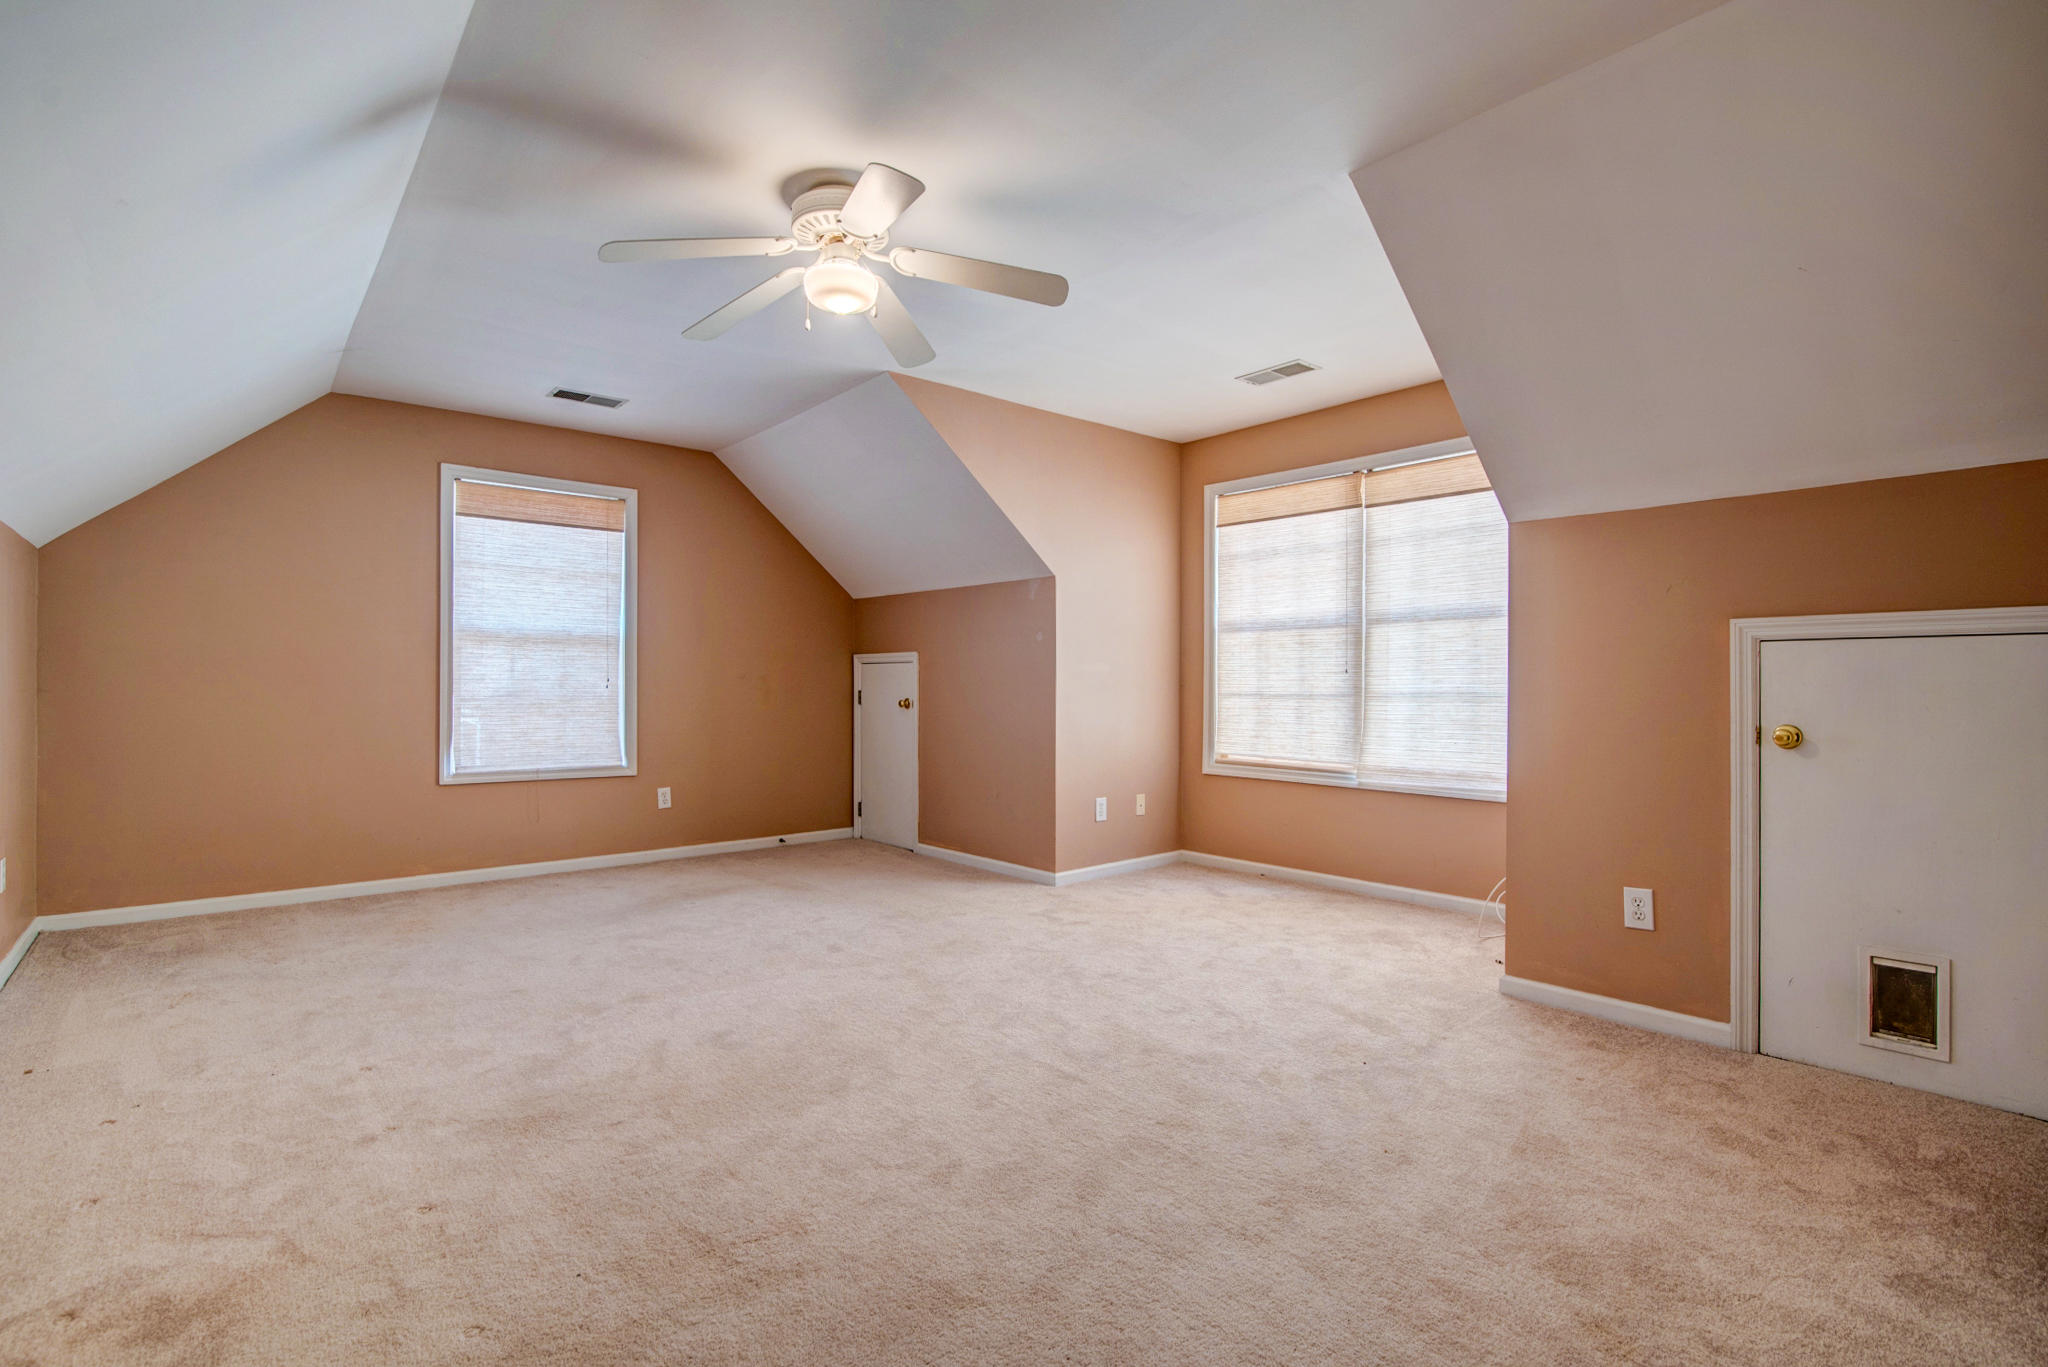 Planters Pointe Homes For Sale - 3382 Lindner, Mount Pleasant, SC - 10